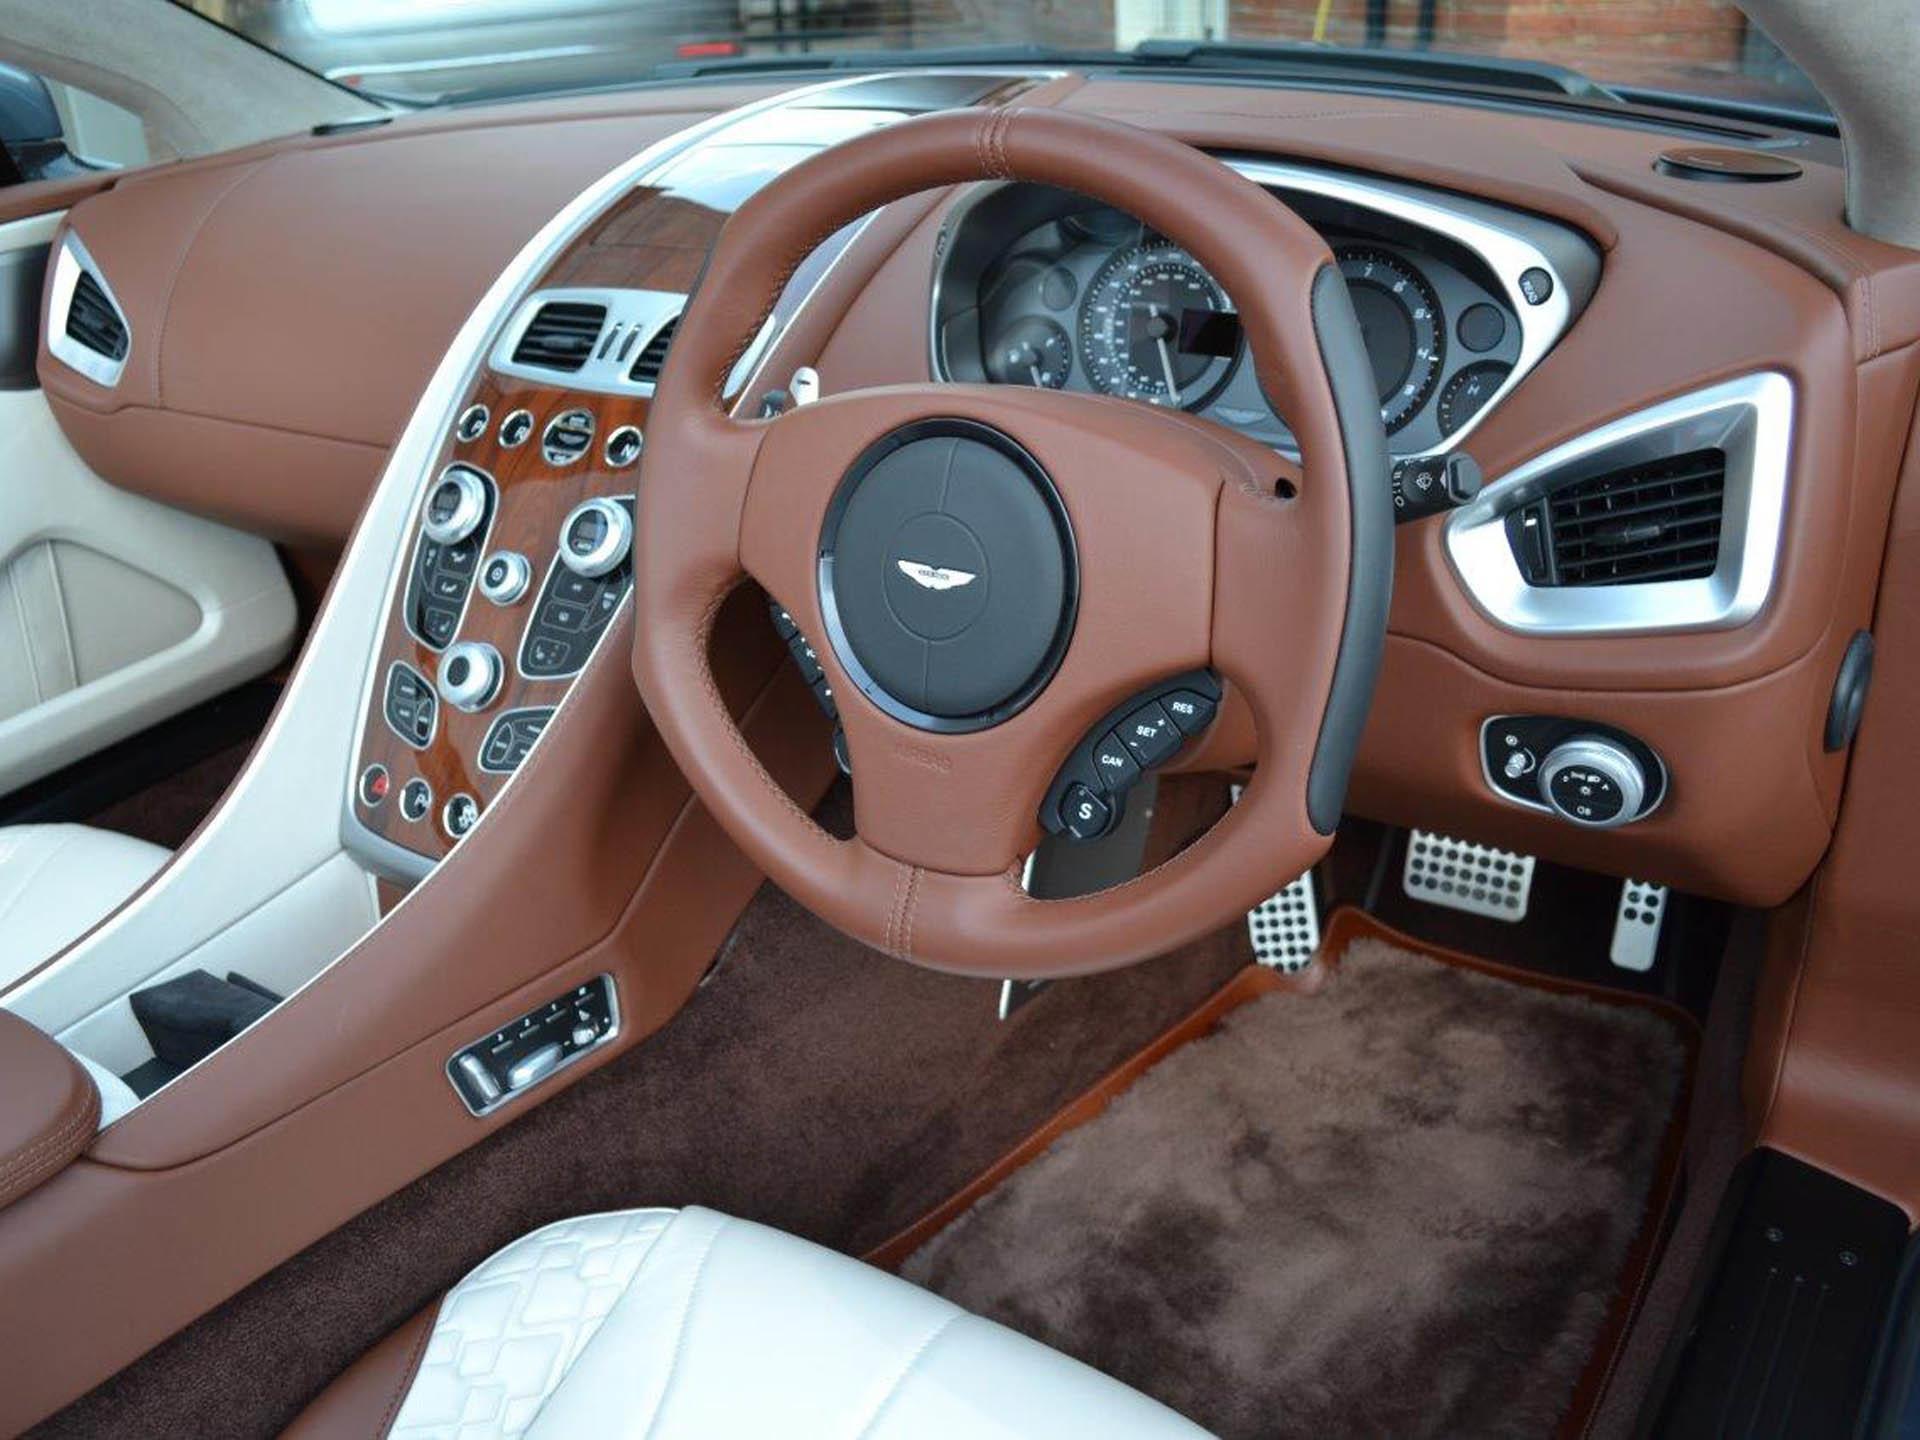 OneofaKind Aston Martin Vanquish Volante Superyachtscom - Aston martin vanquish volante